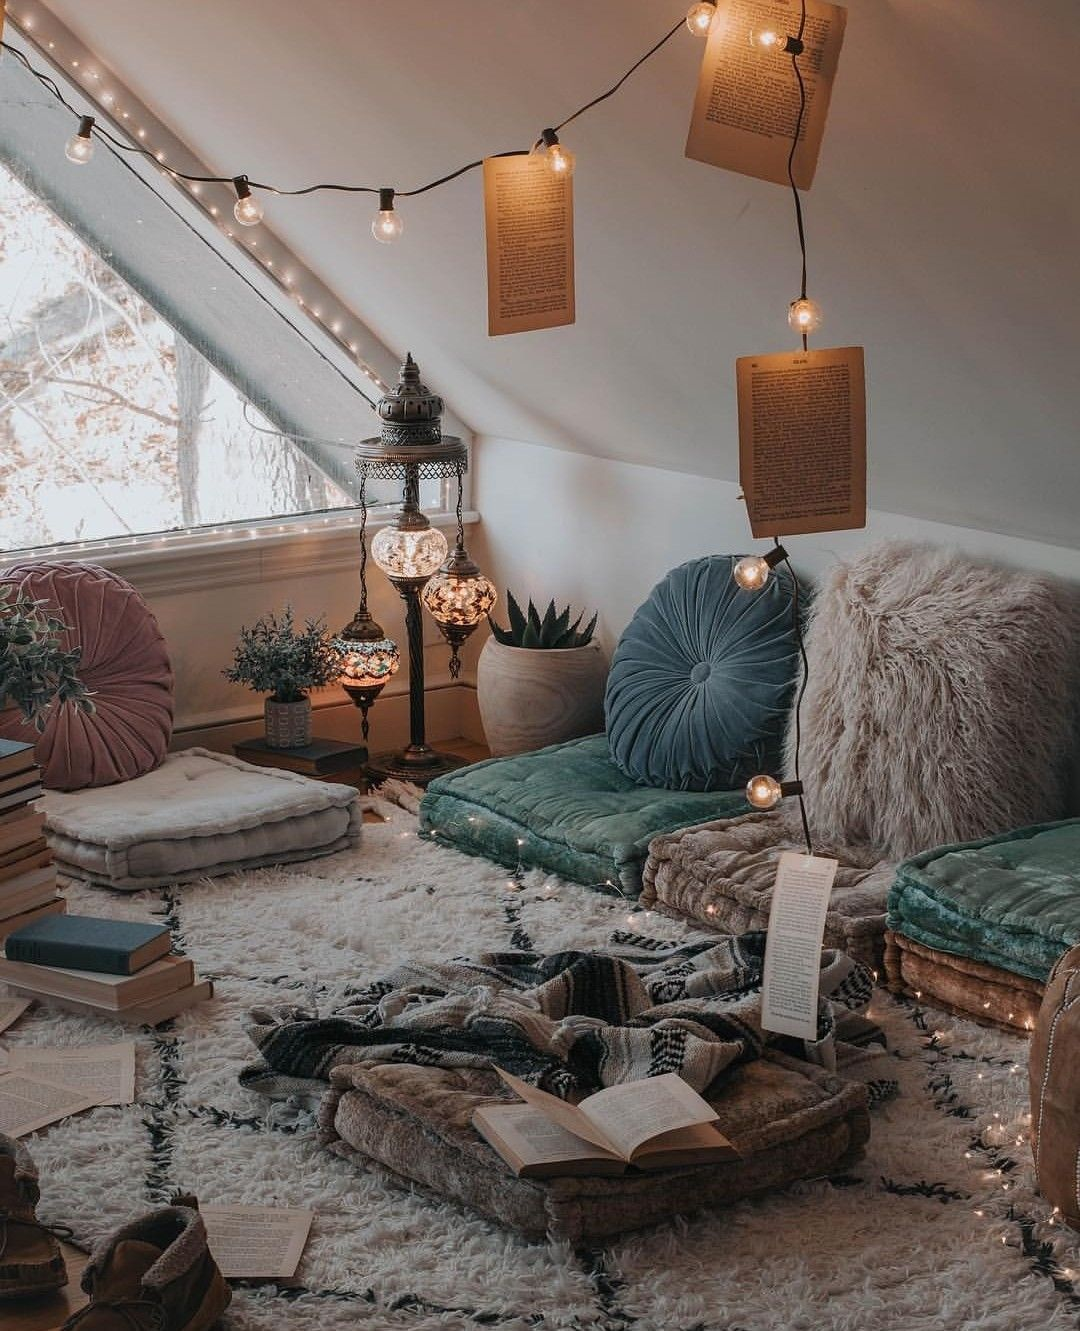 Pin By Sammy Buechler On Boho Tapestry Bedding Cozy Room Chill Room Room Decor